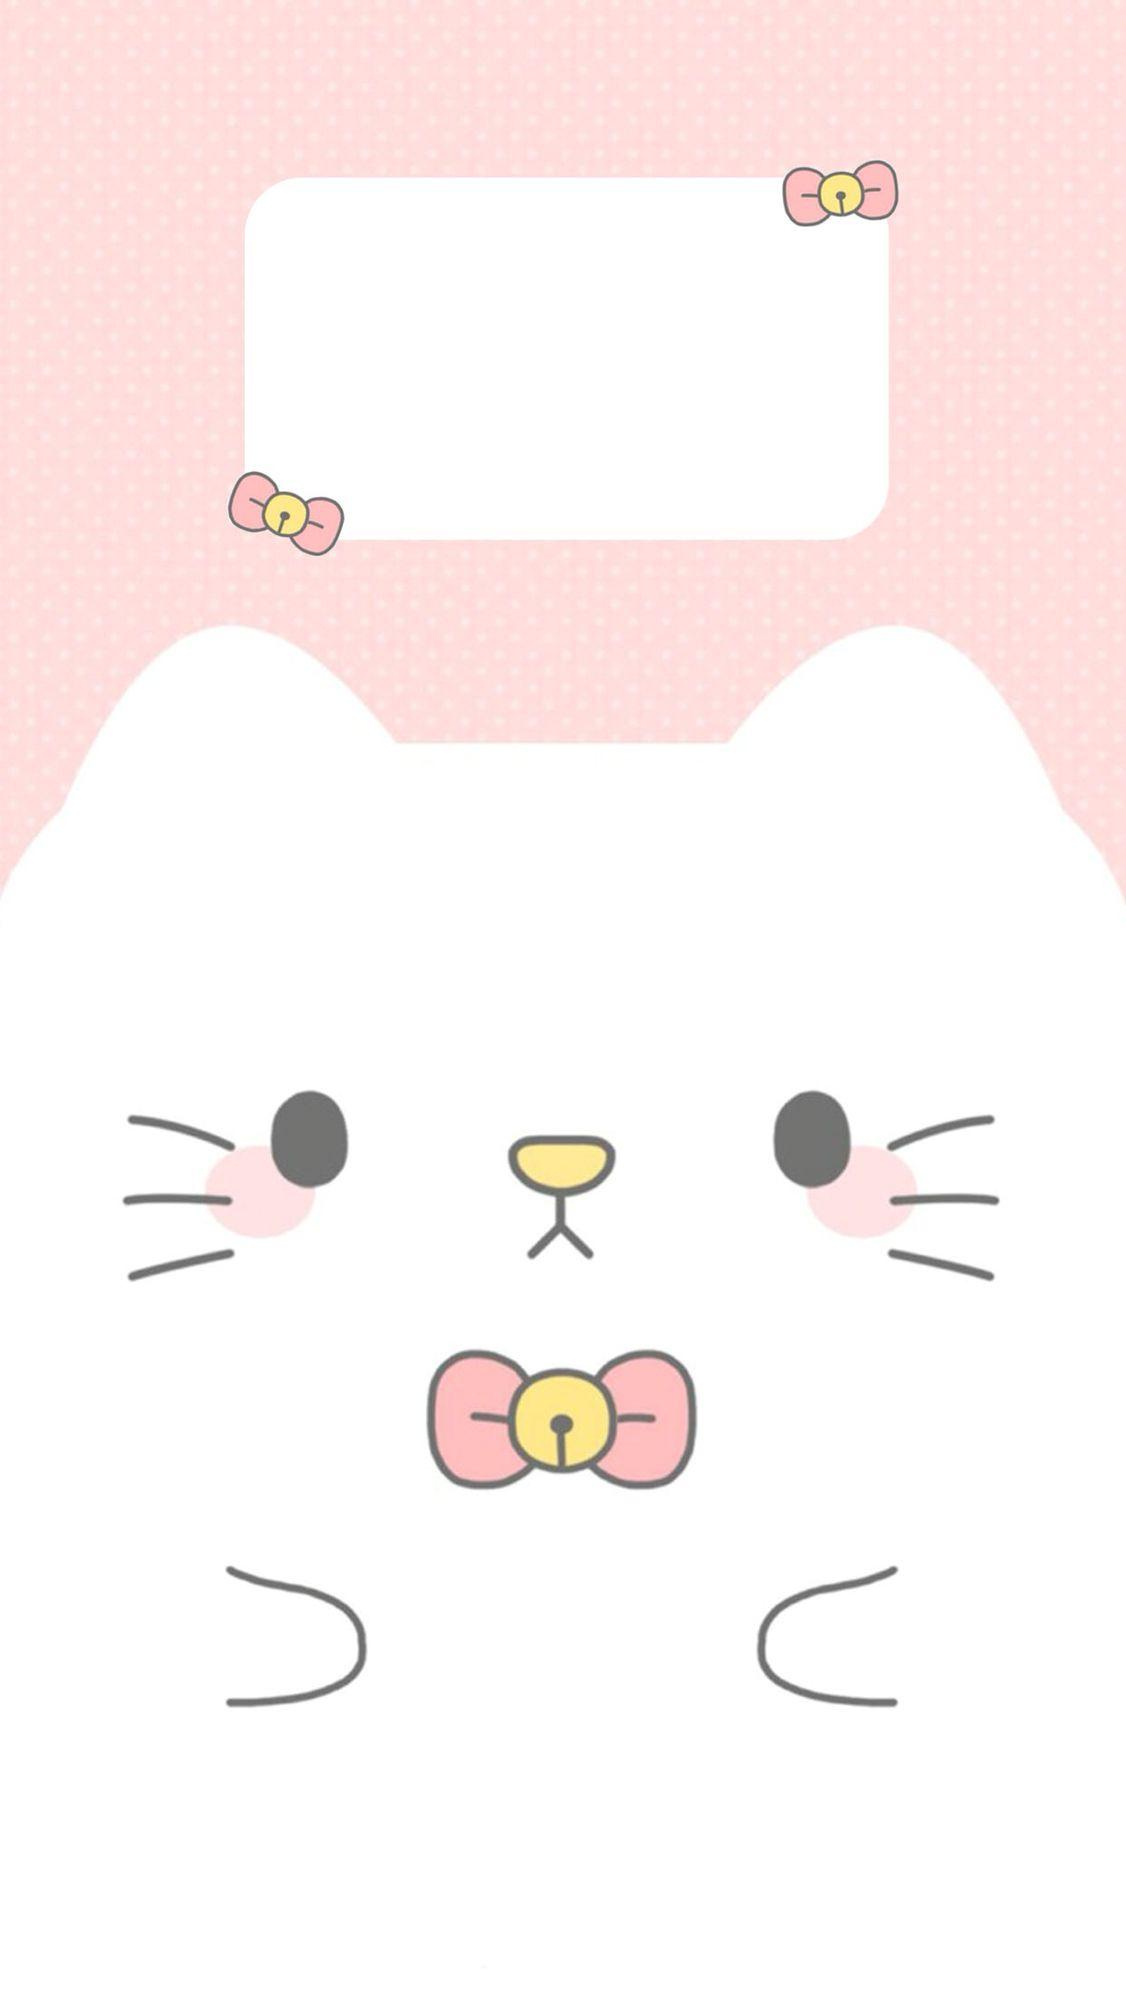 Great Wallpaper Hello Kitty Kawaii - 137f72ecaf1d844def801c4aad1f6083  Perfect Image Reference_283681.jpg